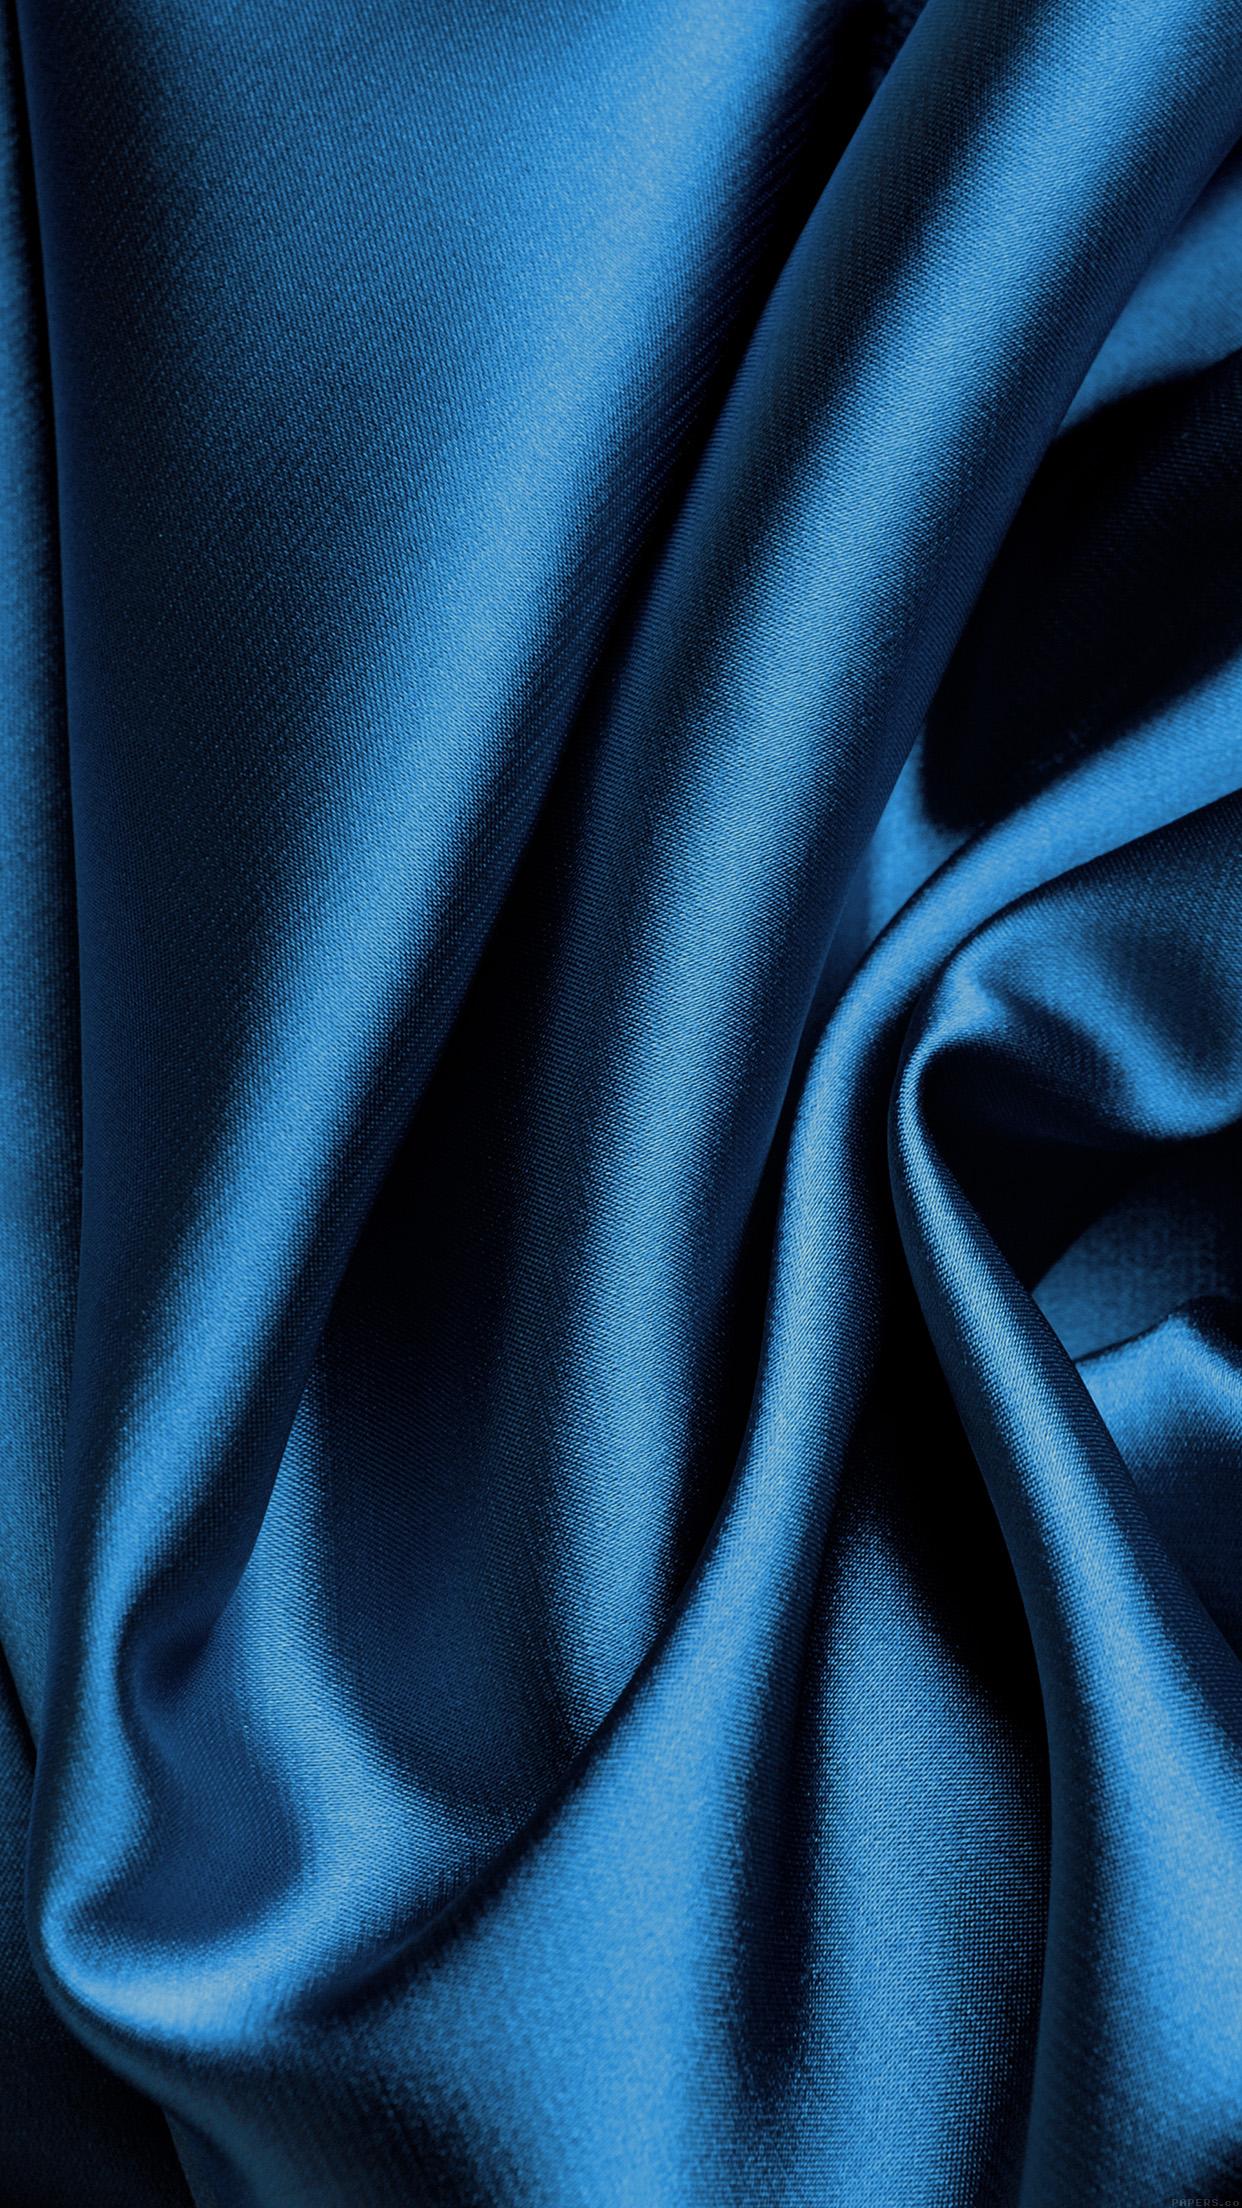 Blue Silk Fabric Texture iPhone 6 Plus HD Wallpaper